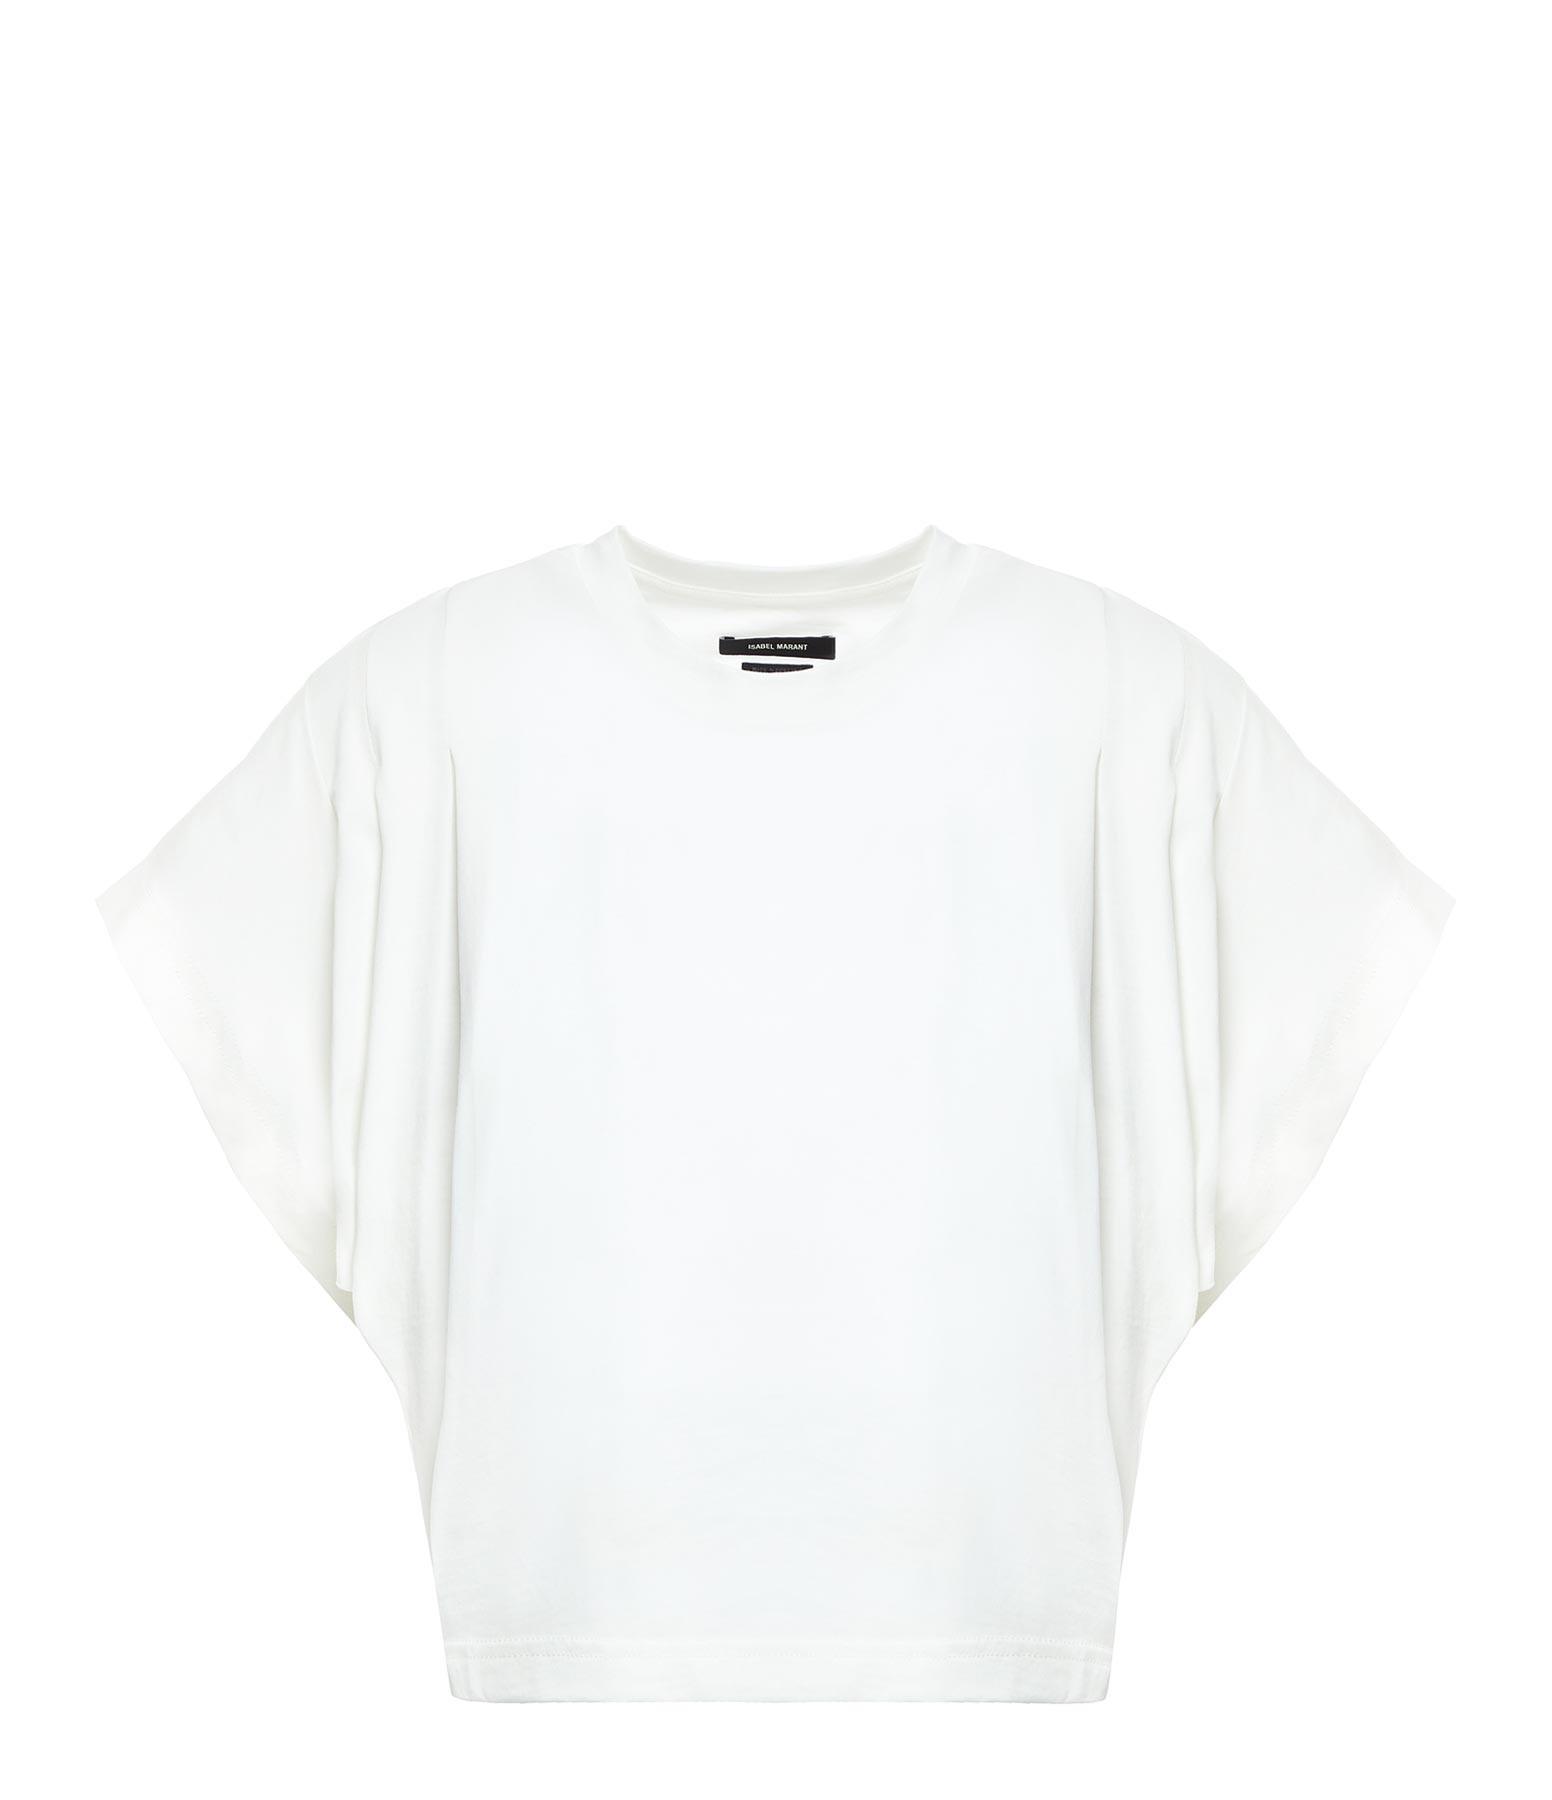 ISABEL MARANT - Tee-shirt Zinalia Coton Écru